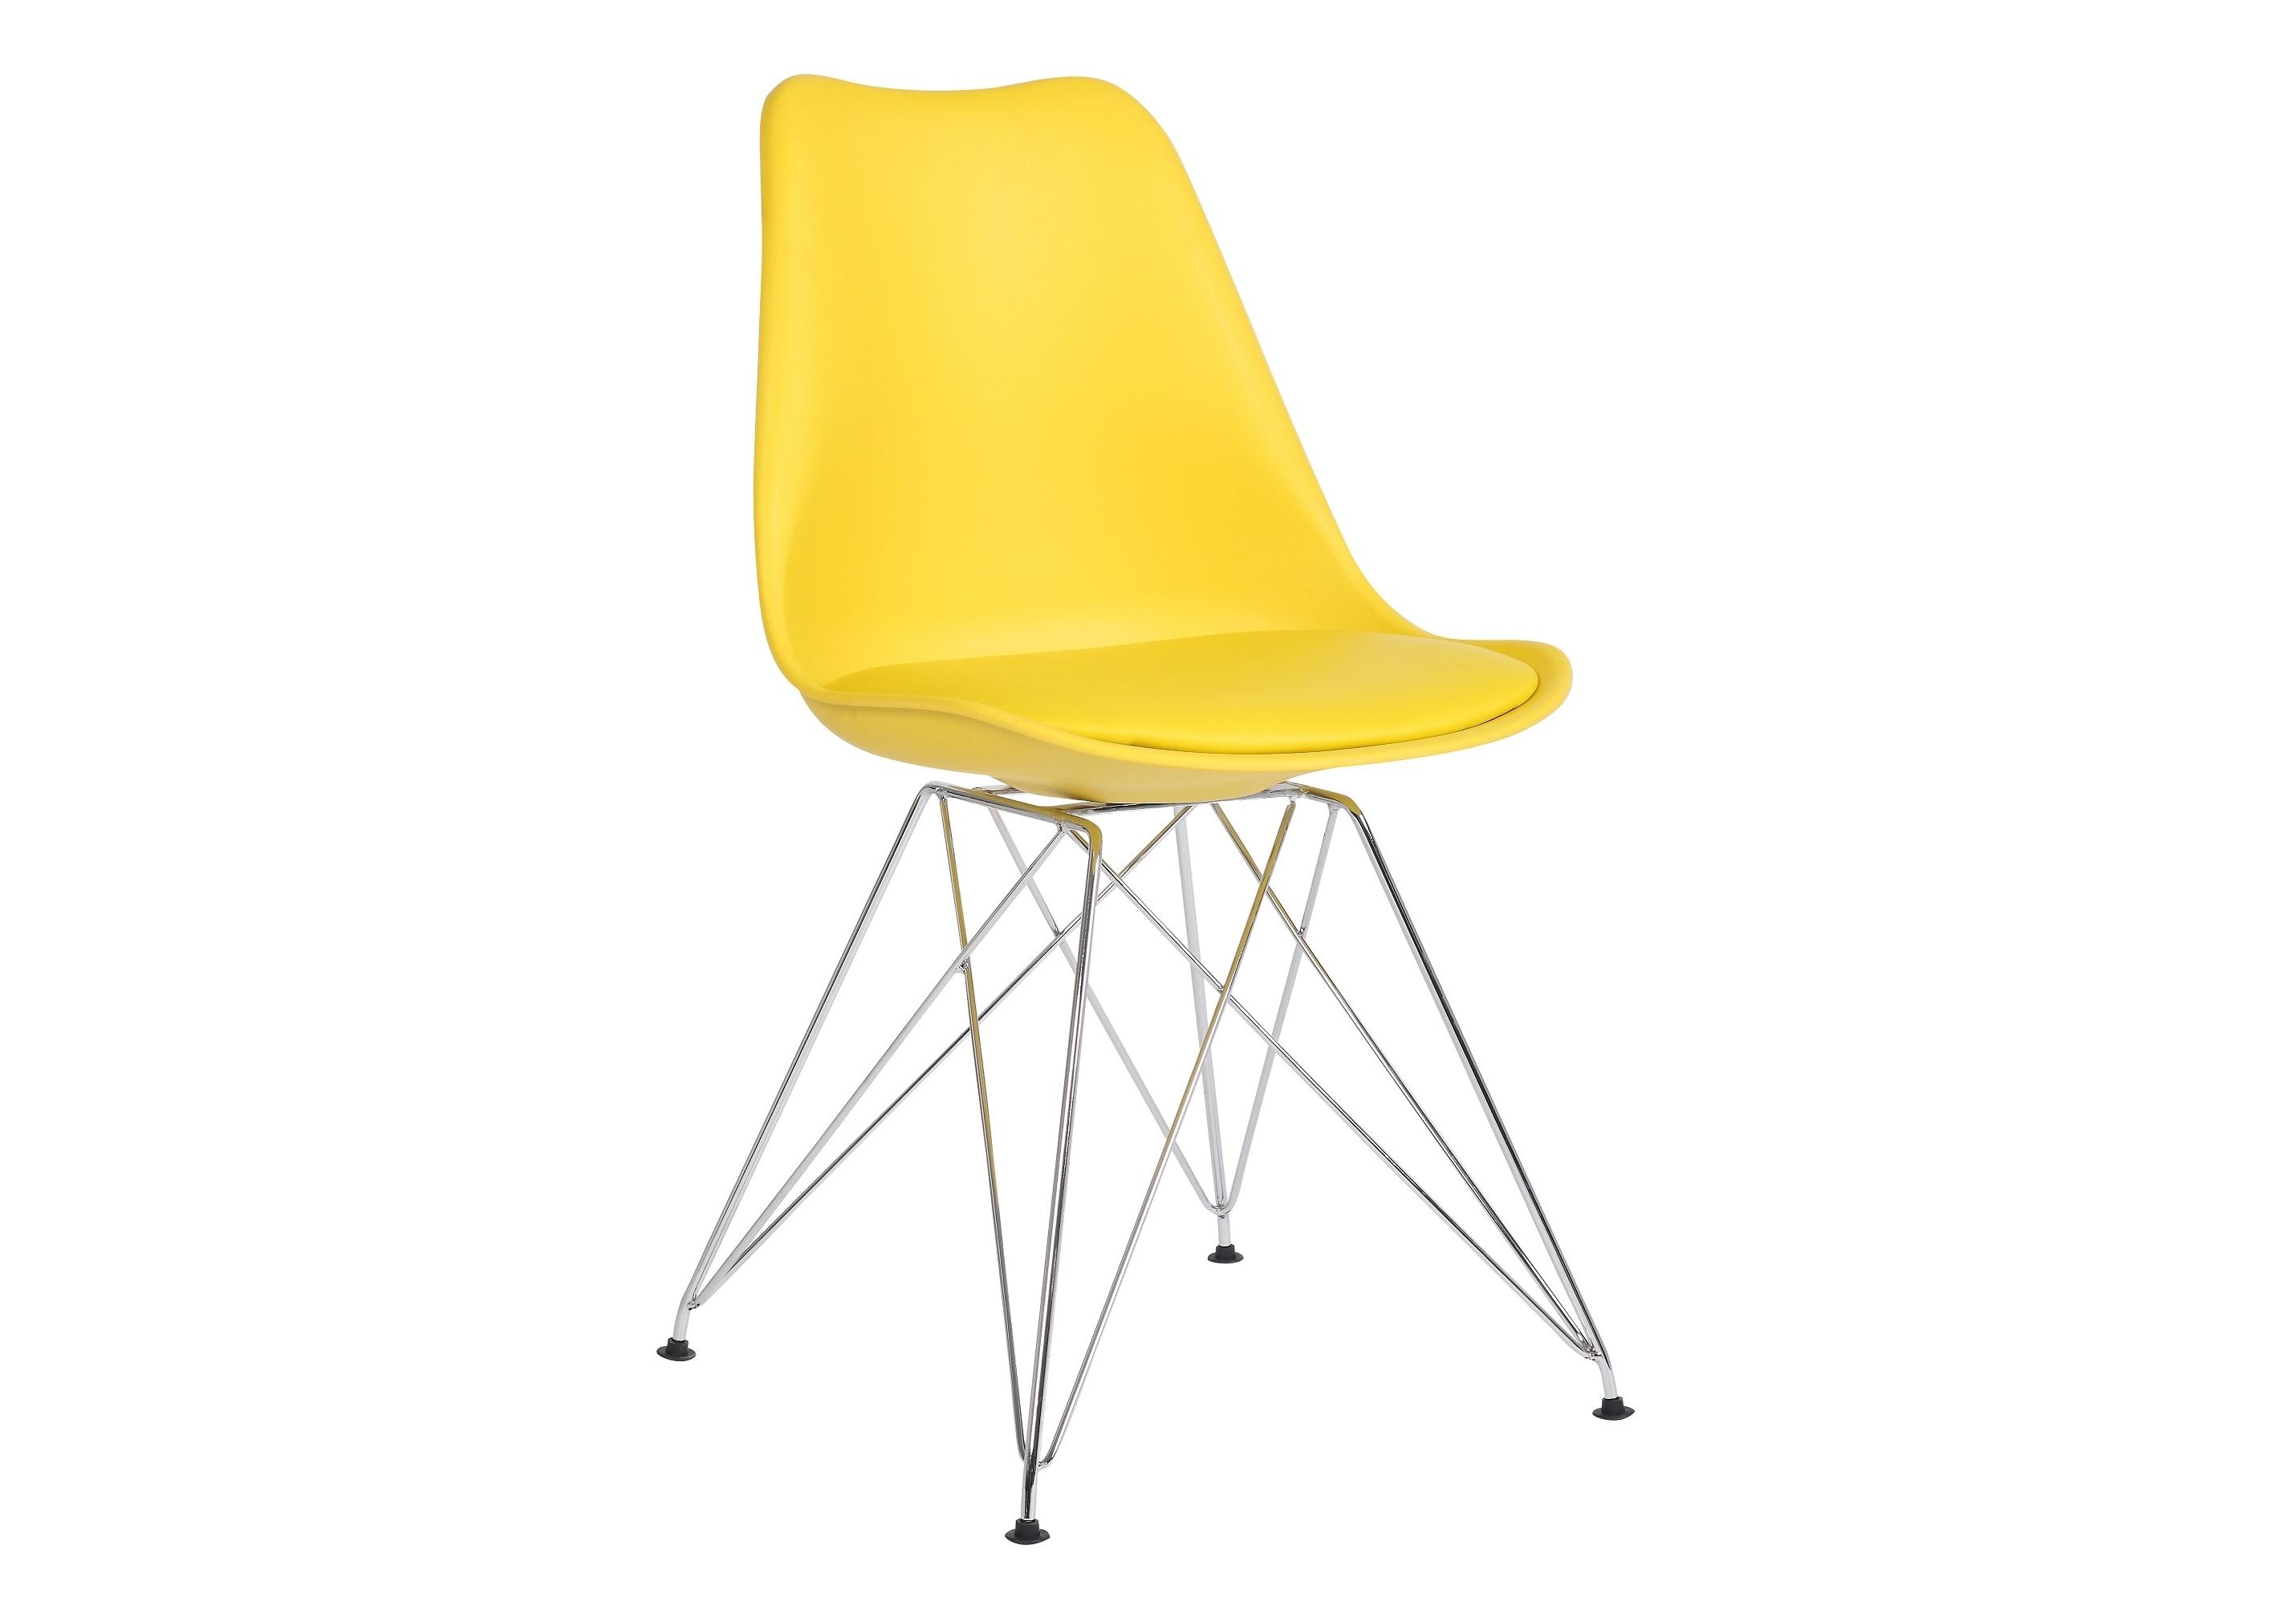 Стул JY18061 желтыйОбеденные стулья<br><br><br>Material: Пластик<br>Ширина см: 48<br>Высота см: 87<br>Глубина см: 48